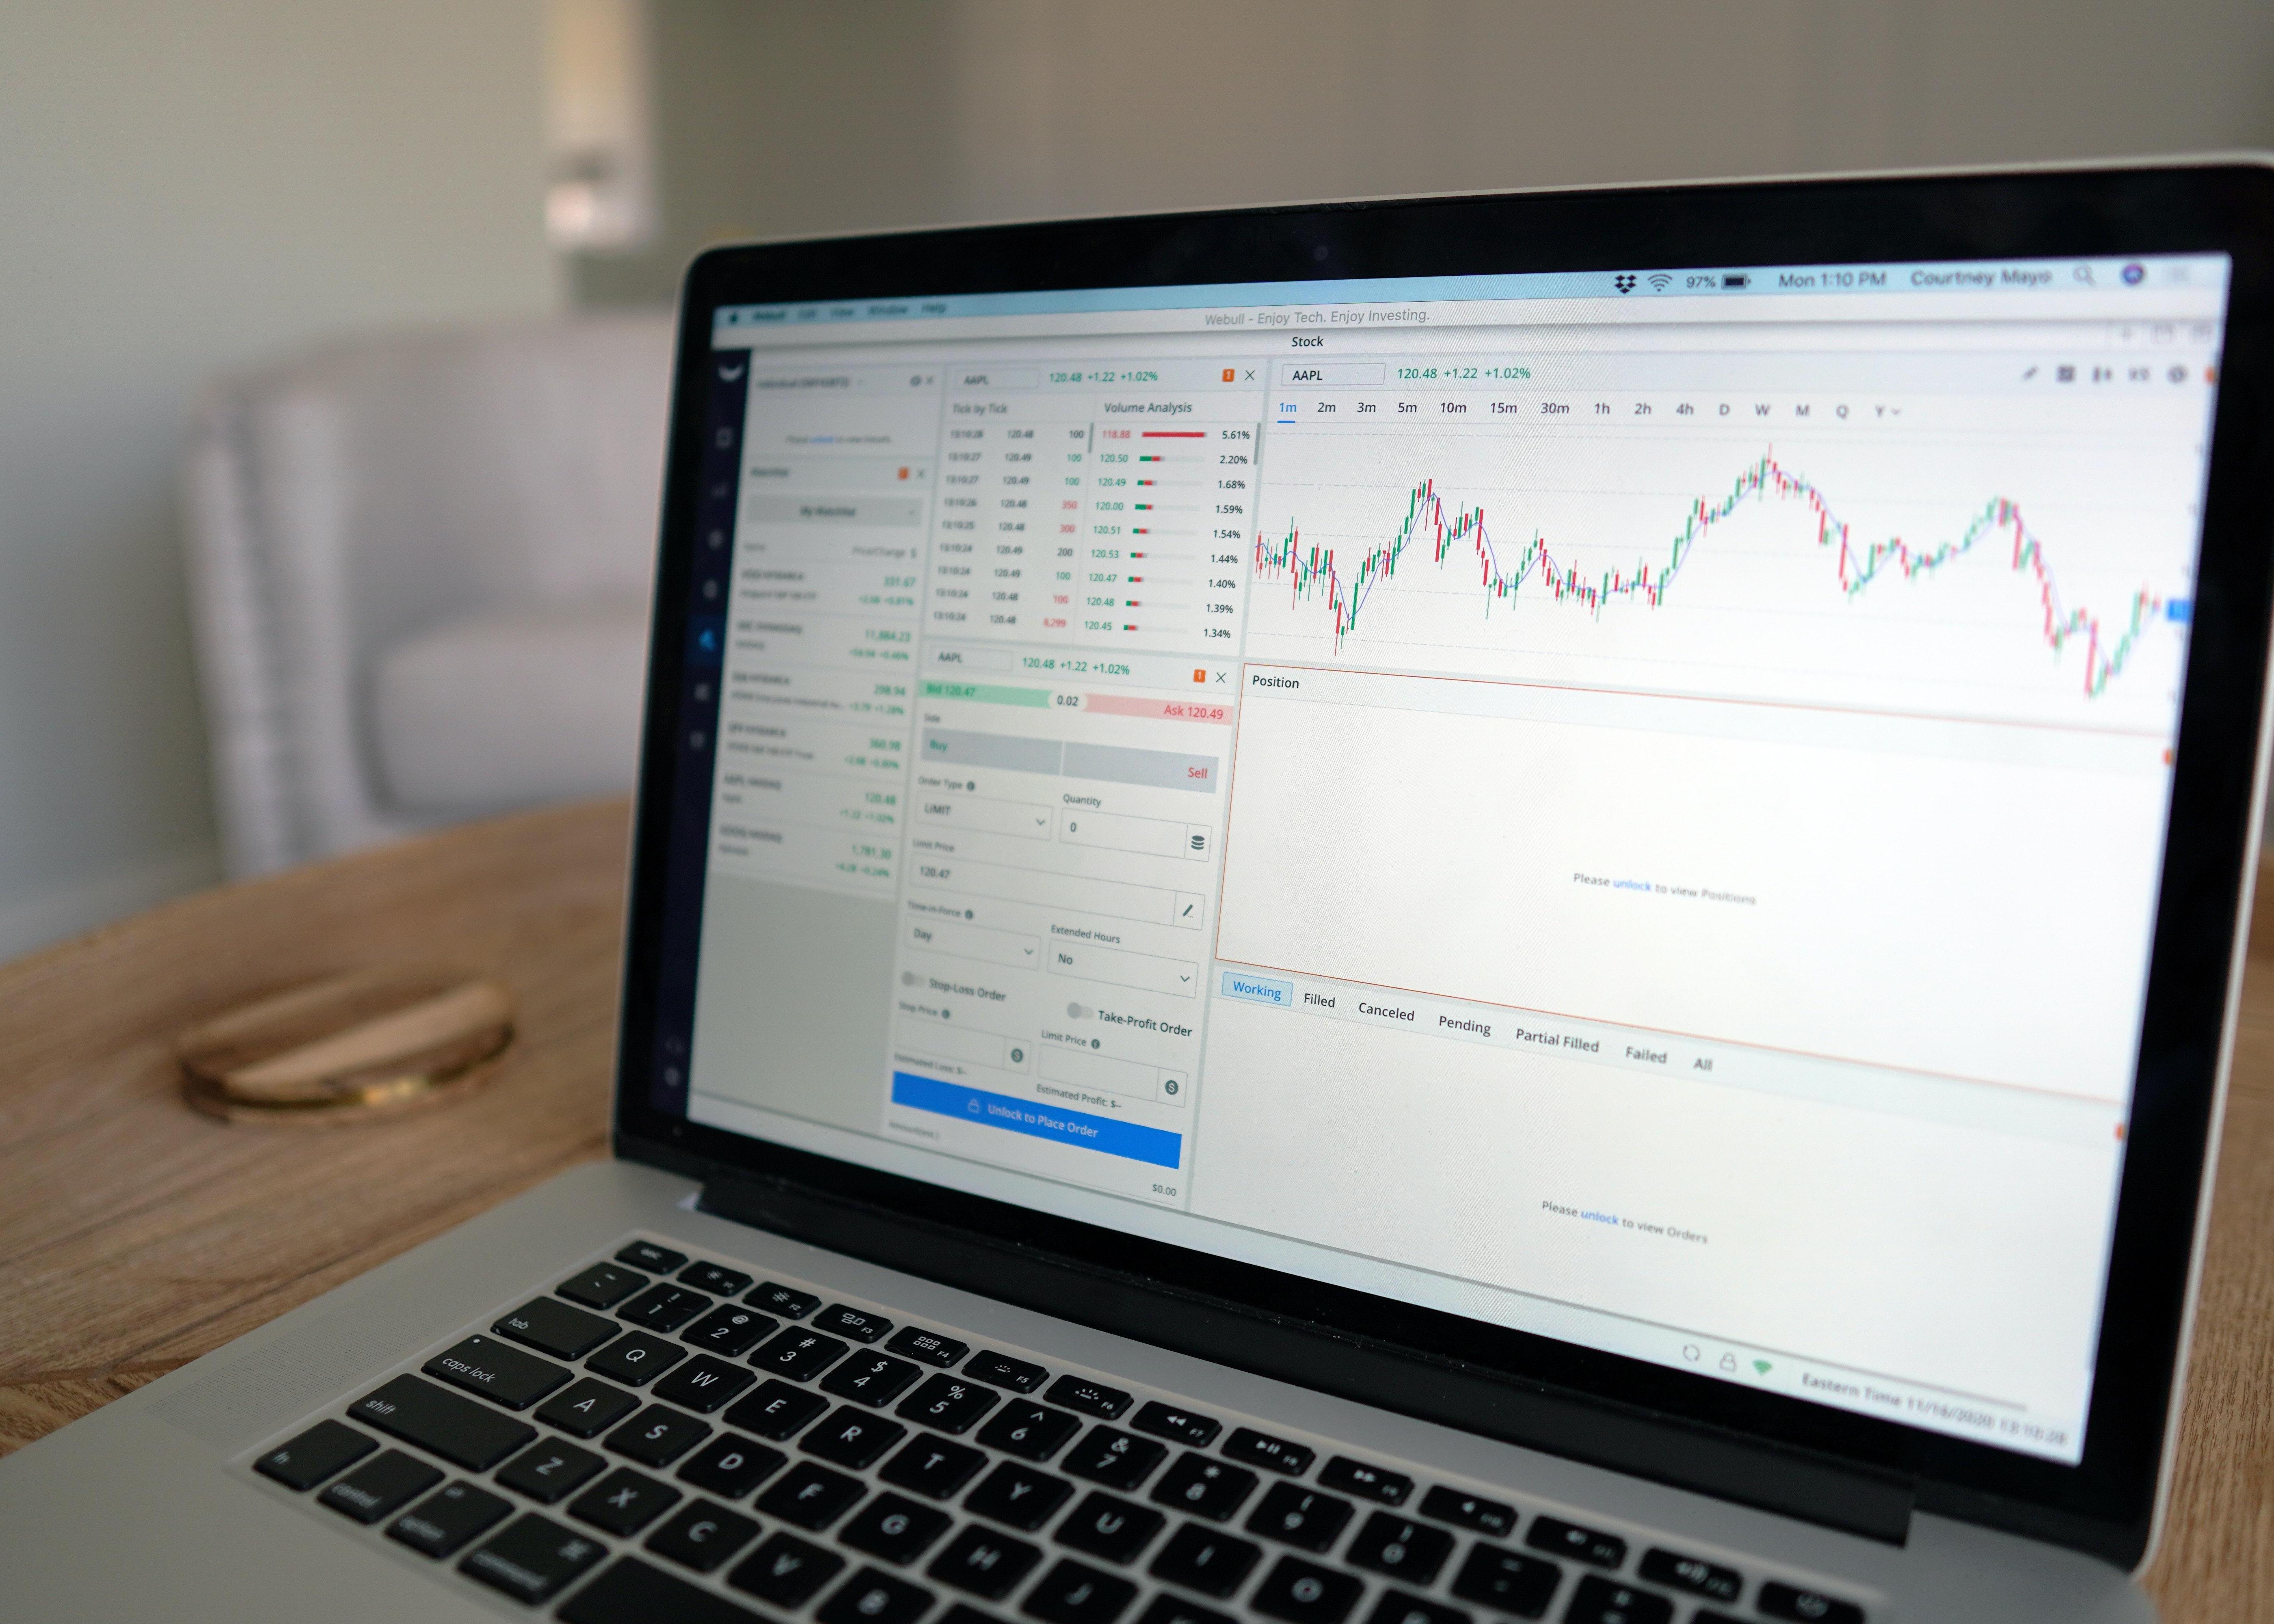 Standard and Poors 500 / Volatility Index Correlation Thumbnail